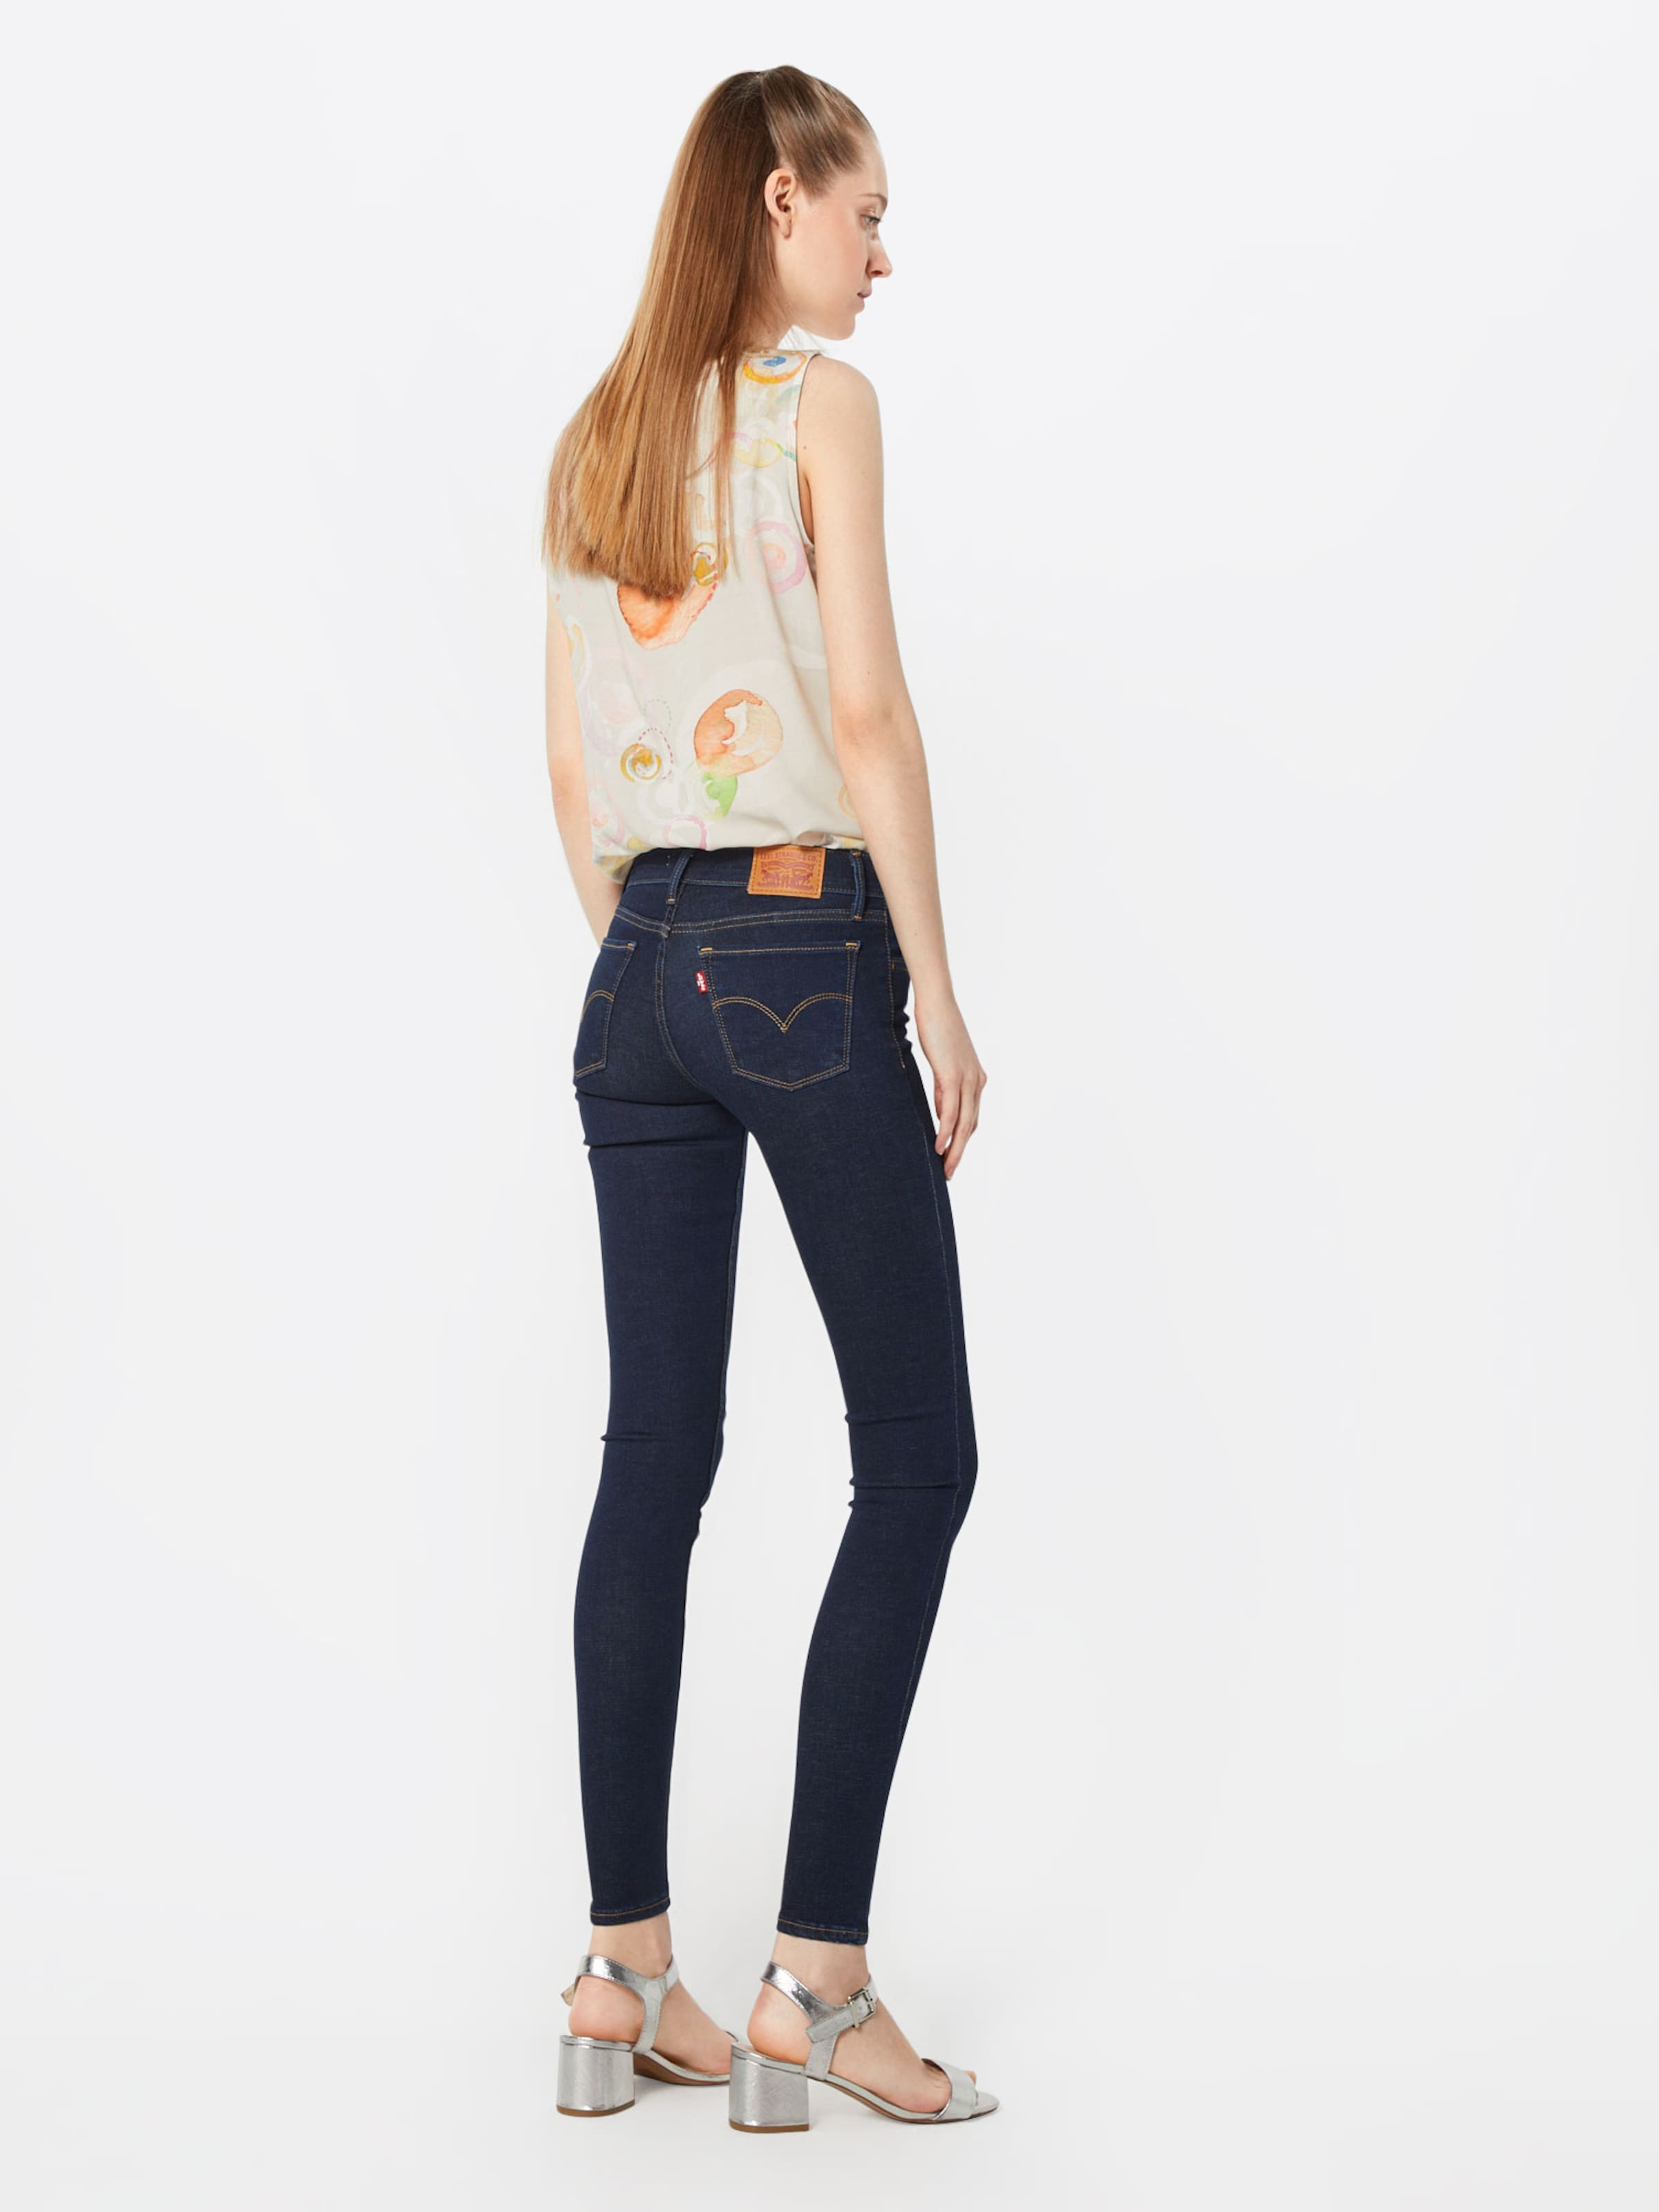 In Jeans '710 Skinny' Blauw Denim Super Innovation Levi's nXBfxZqzq